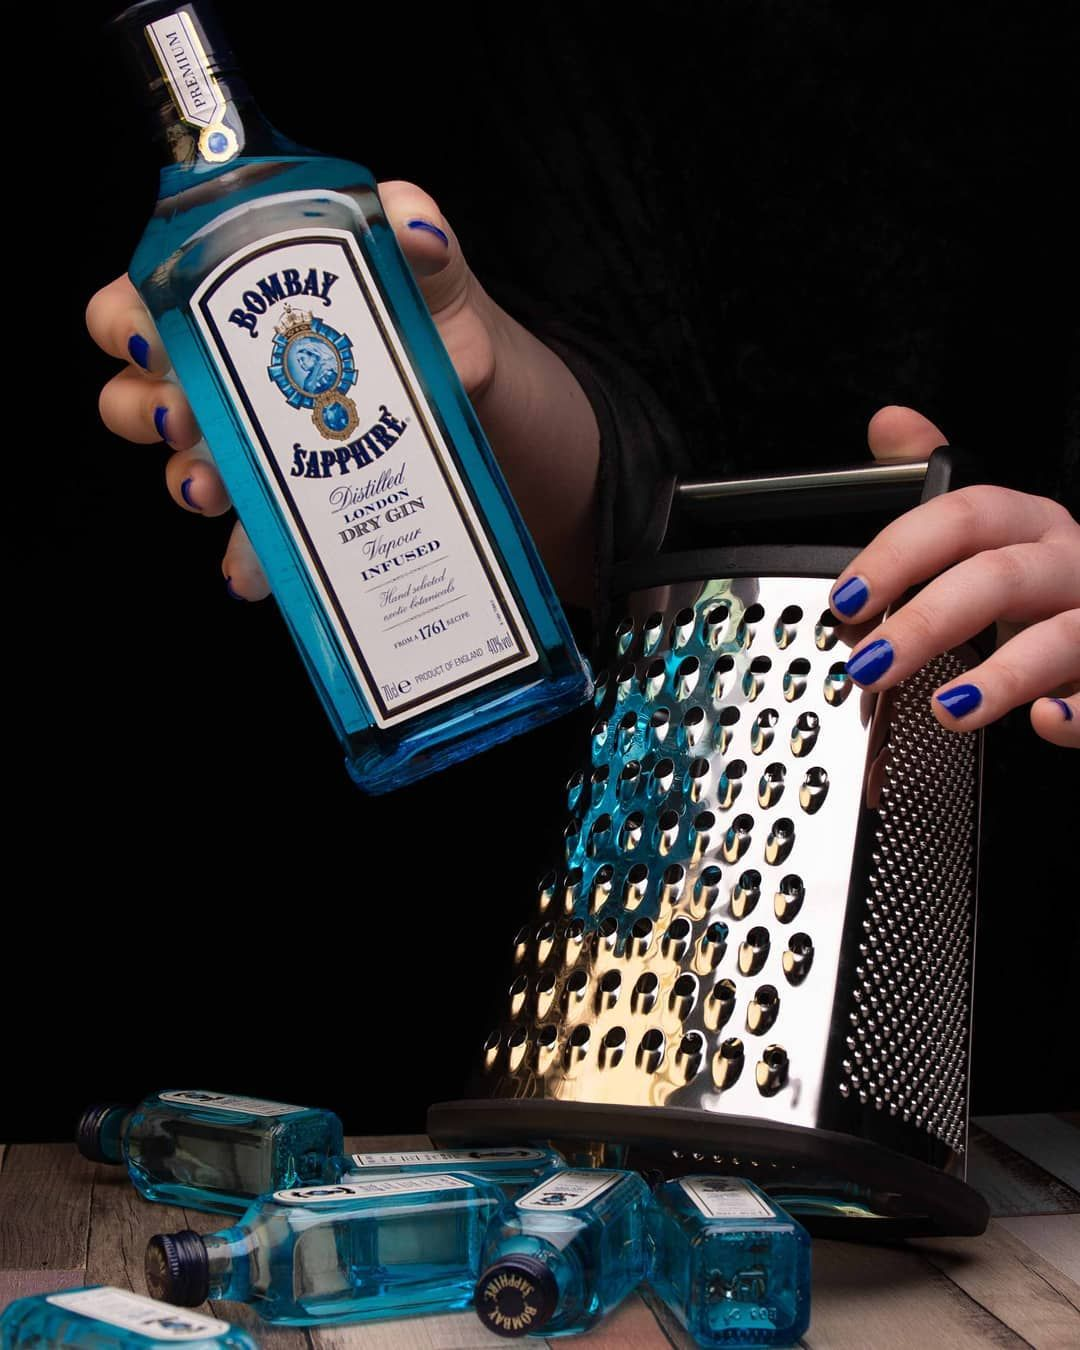 Gin. #minatures #gin #bombaysapphire #bombaysapphiregin #grater #amber #studiophotography #nikond7200 #nikonphotography #nikon #reflections #blueglass #bluenails #drinkresponsibly #bombaydistillery? #ginoclock #londondrygin